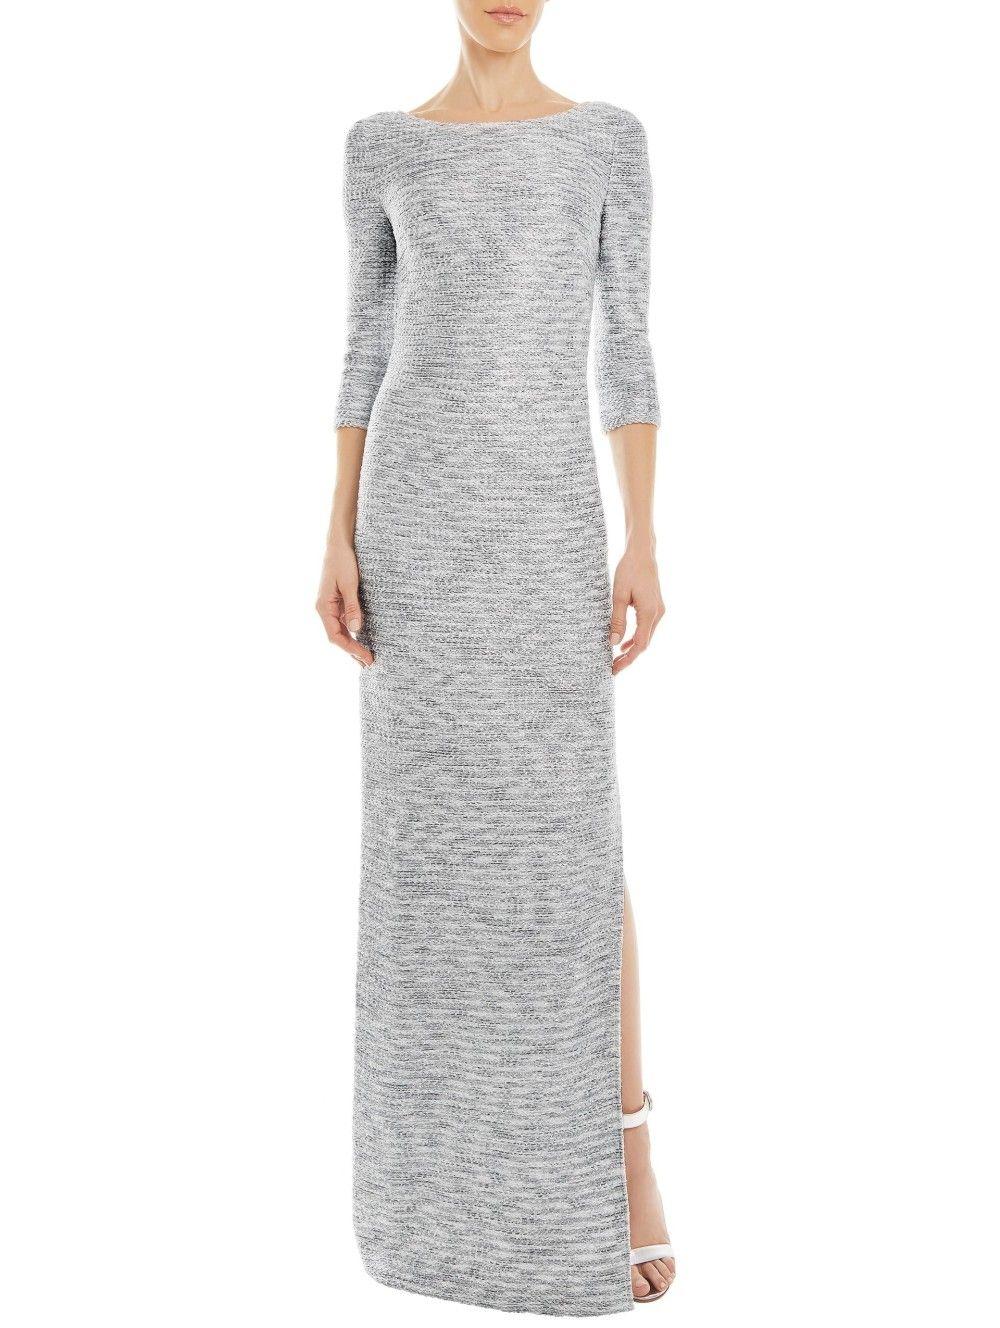 Glint+Knit+Bateau+Neck+Dress